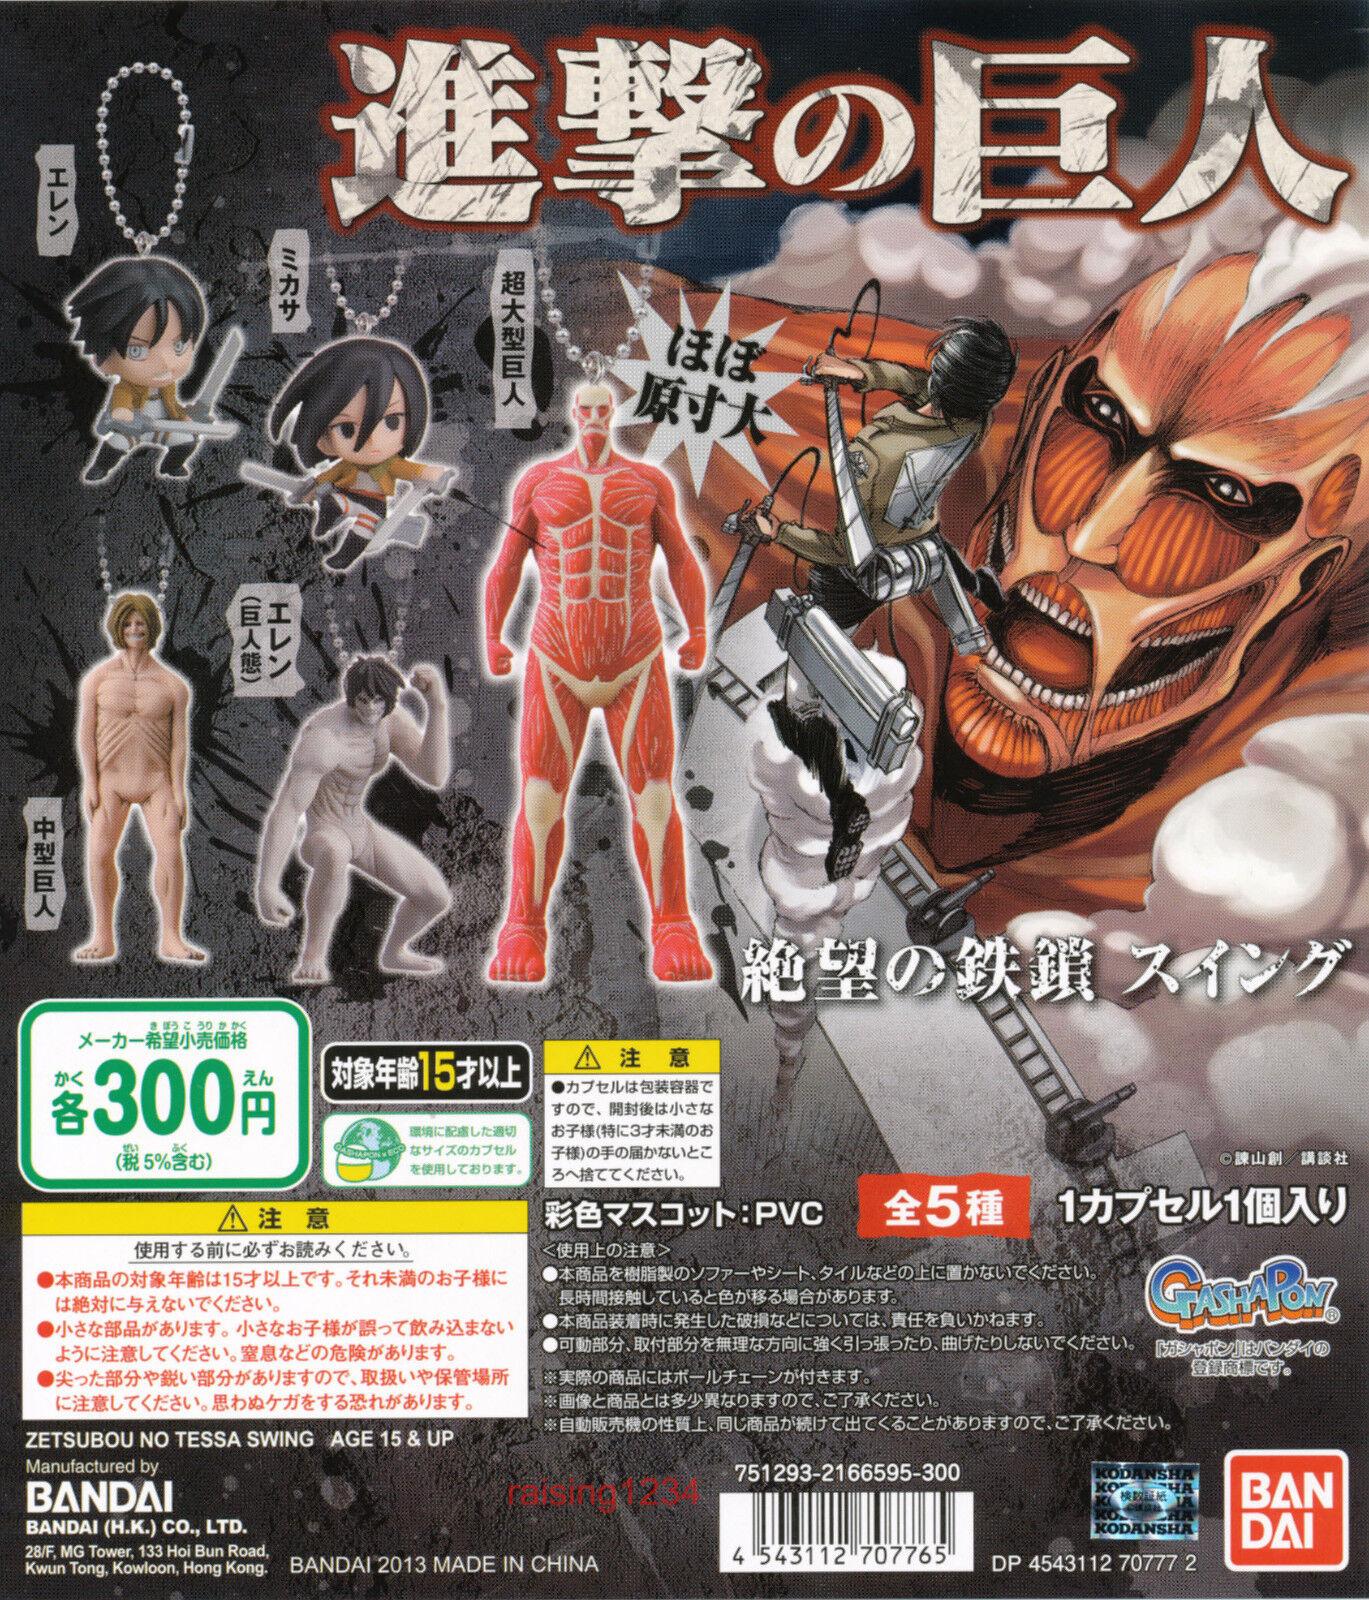 Bandai Attack on Titan Keychain Figure Zetsubou no Tessa Swing set of 5 Colossal